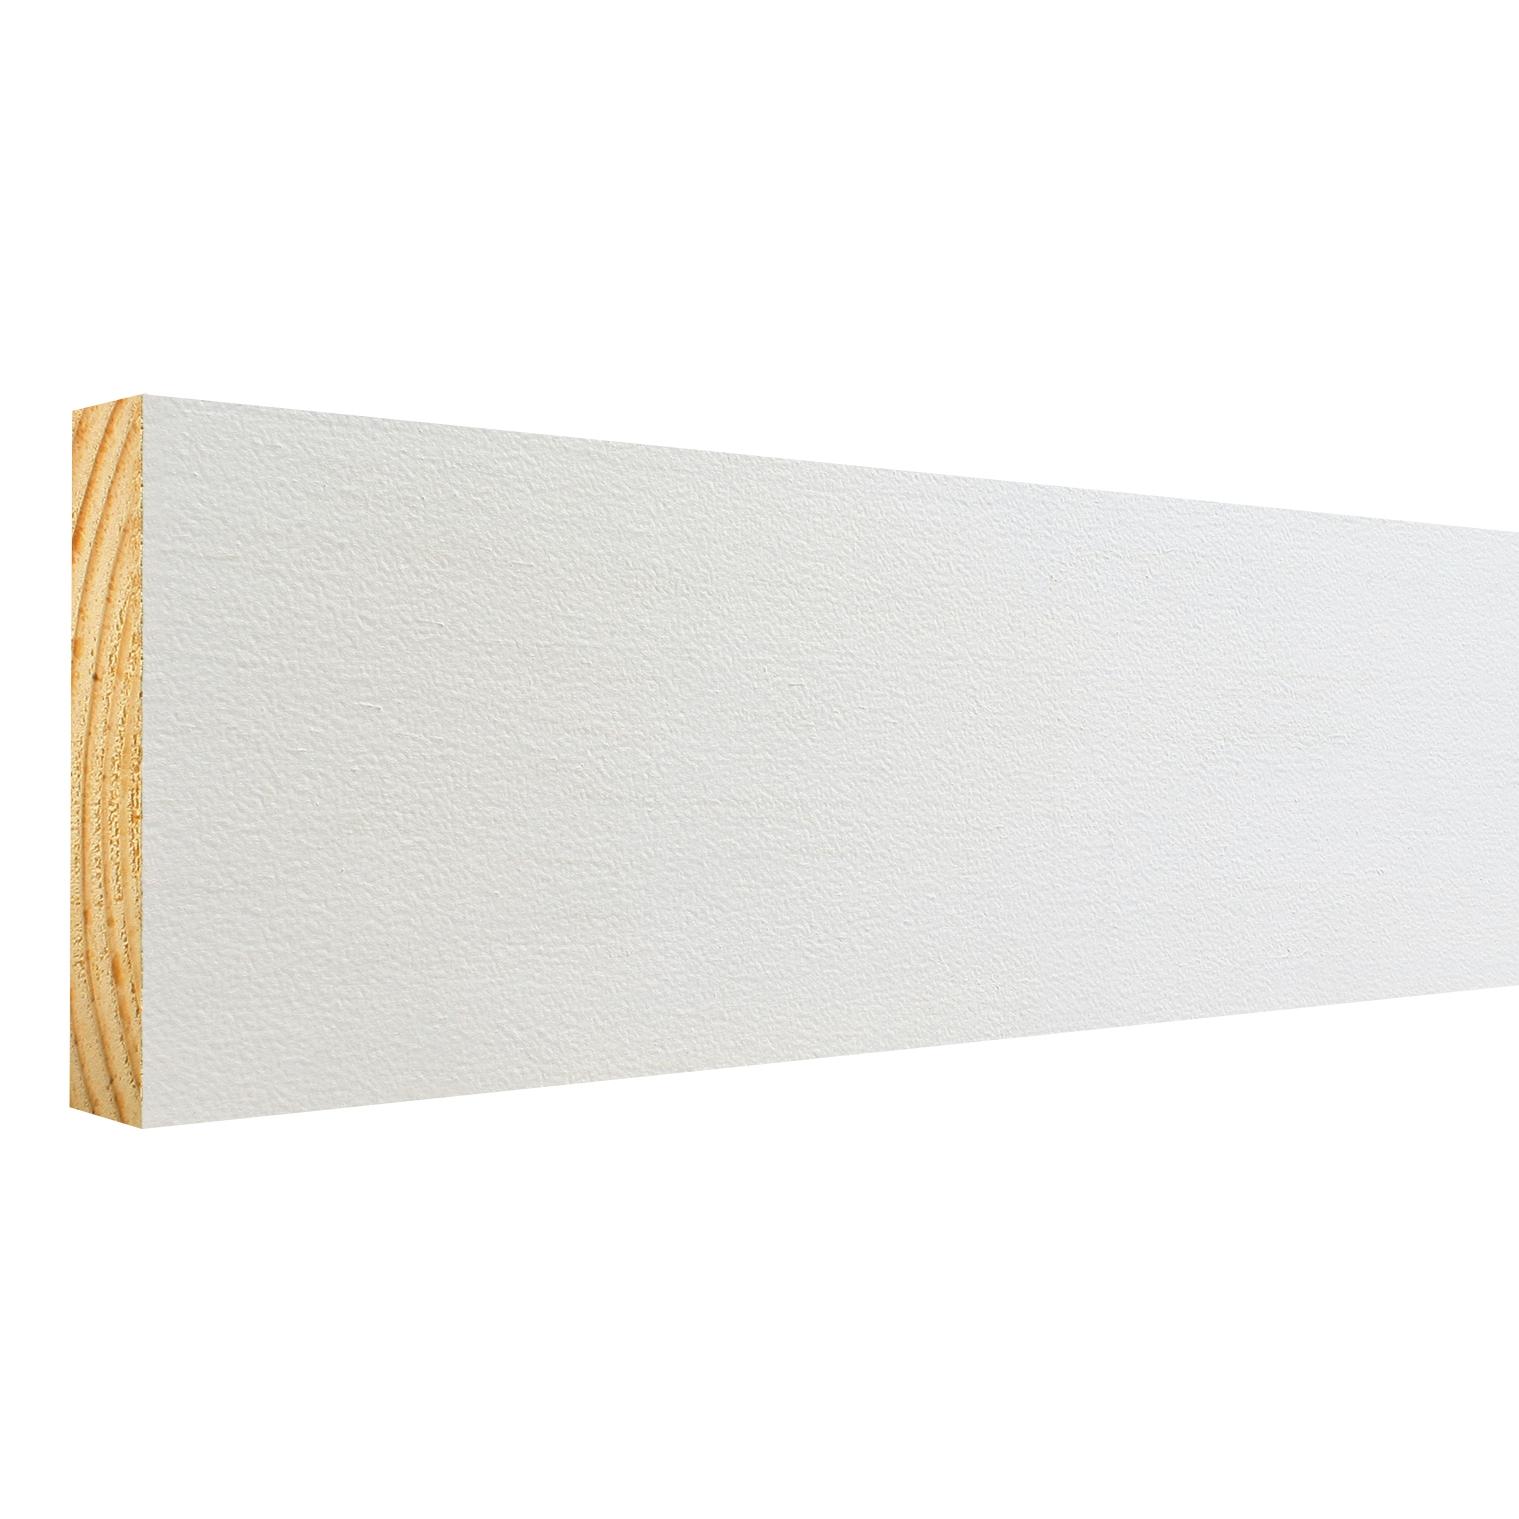 1x4 Board